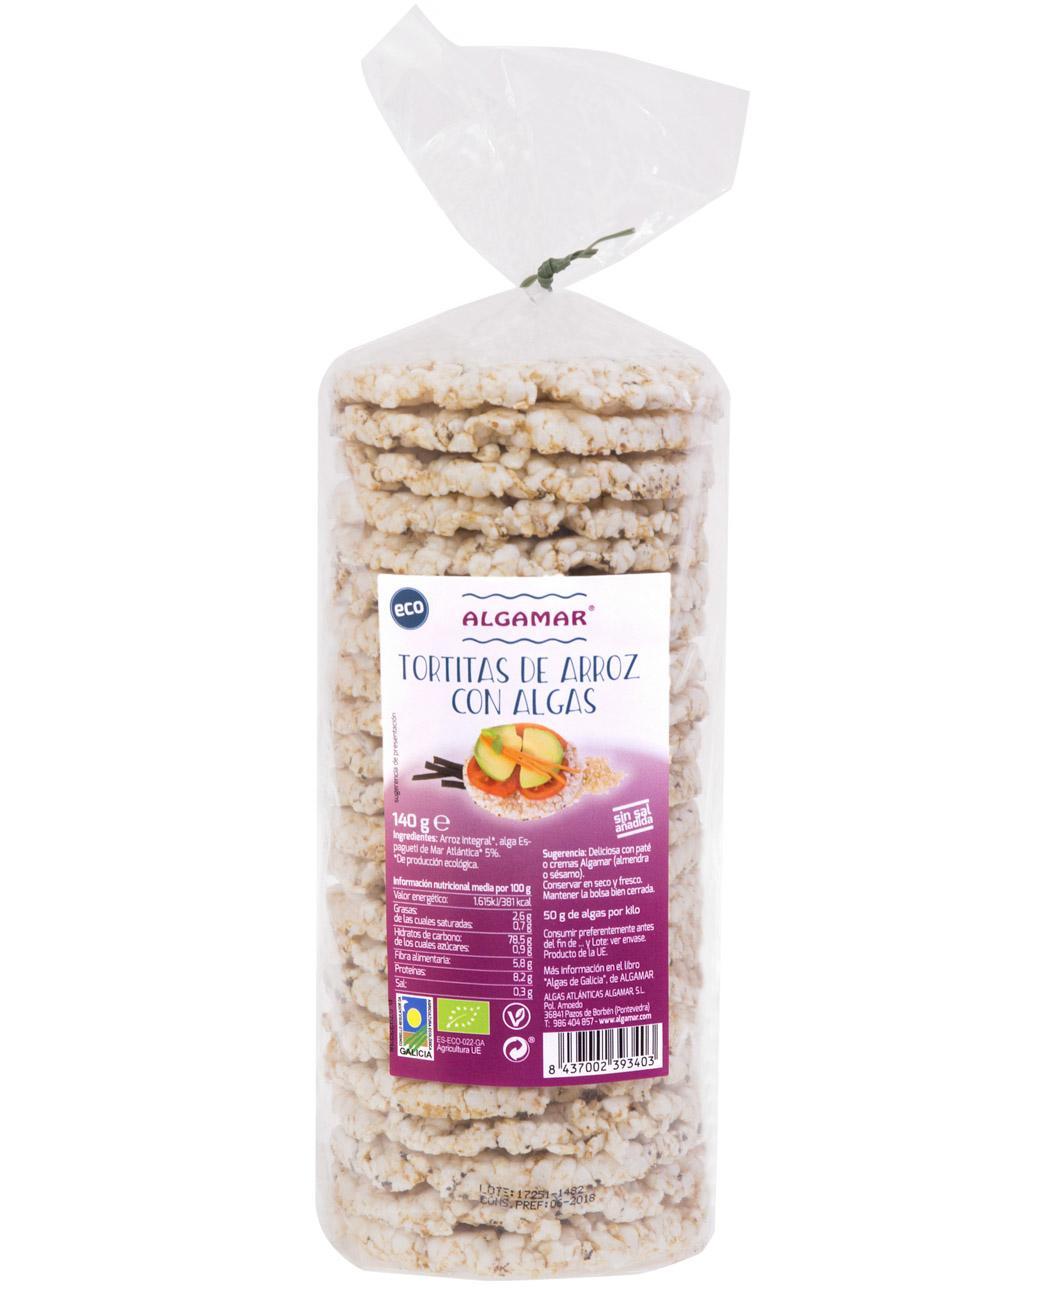 20-algamar-tortitas-arroz-con-algas-140g